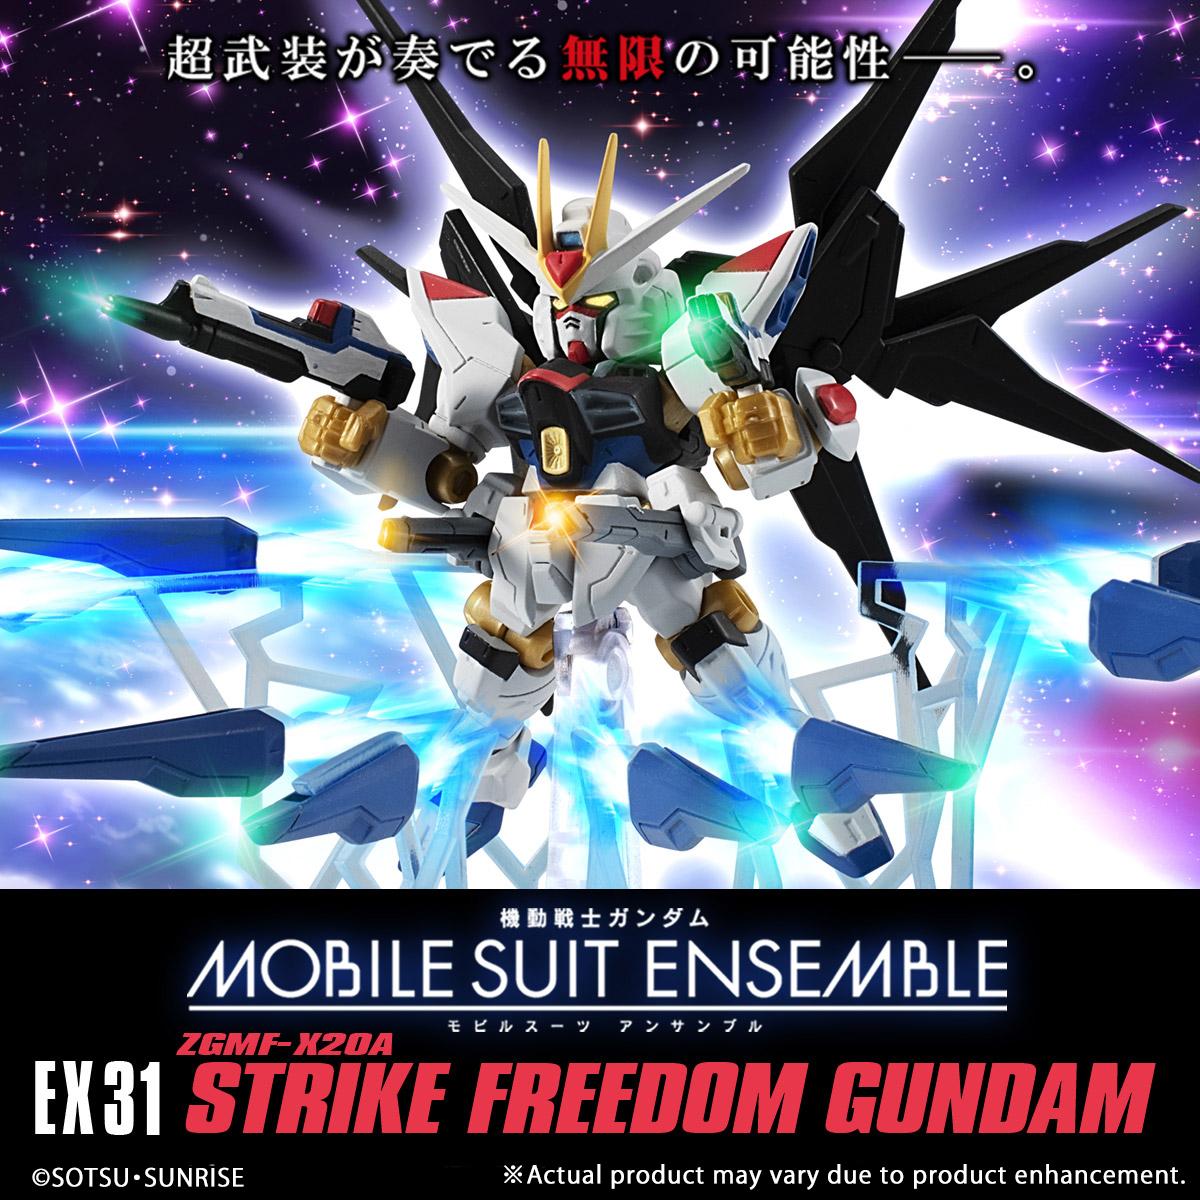 MOBILE SUIT ENSEMBLE EX31 STRIKE FREEDOM GUNDAM